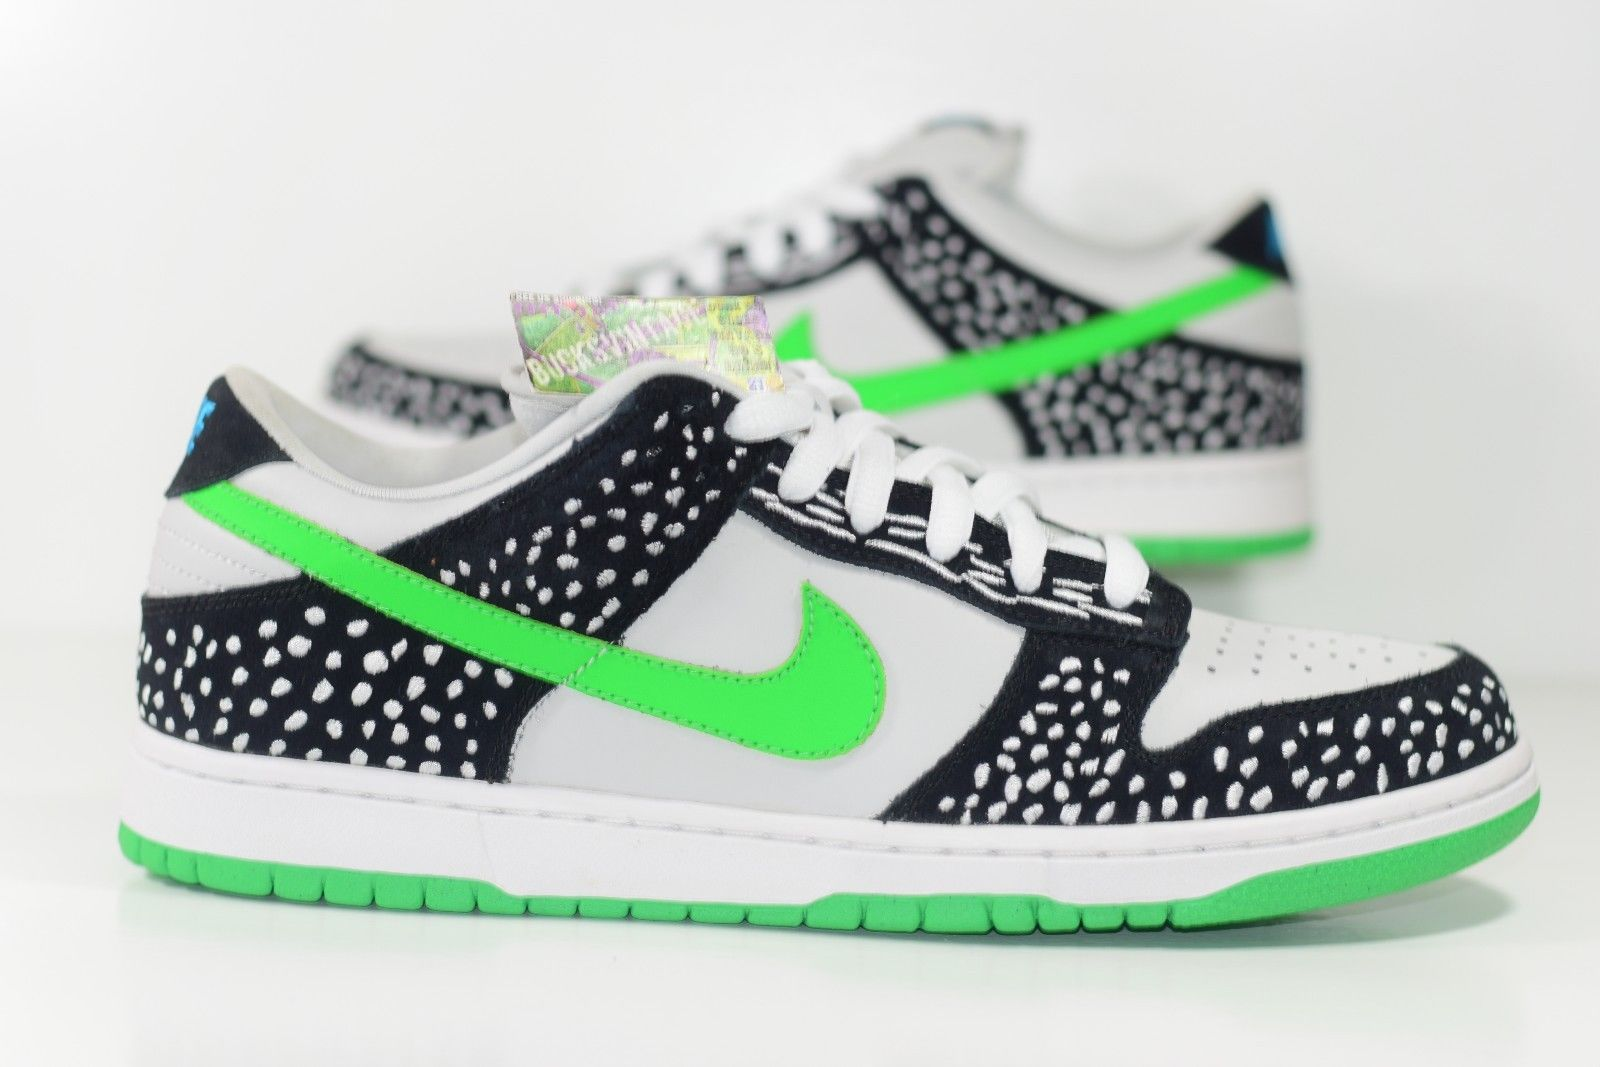 innovative design 6a789 319ff Size 11   2010 Nike dunk SB Low Premium LOON NEW 313170-011 - Thumbnail ...